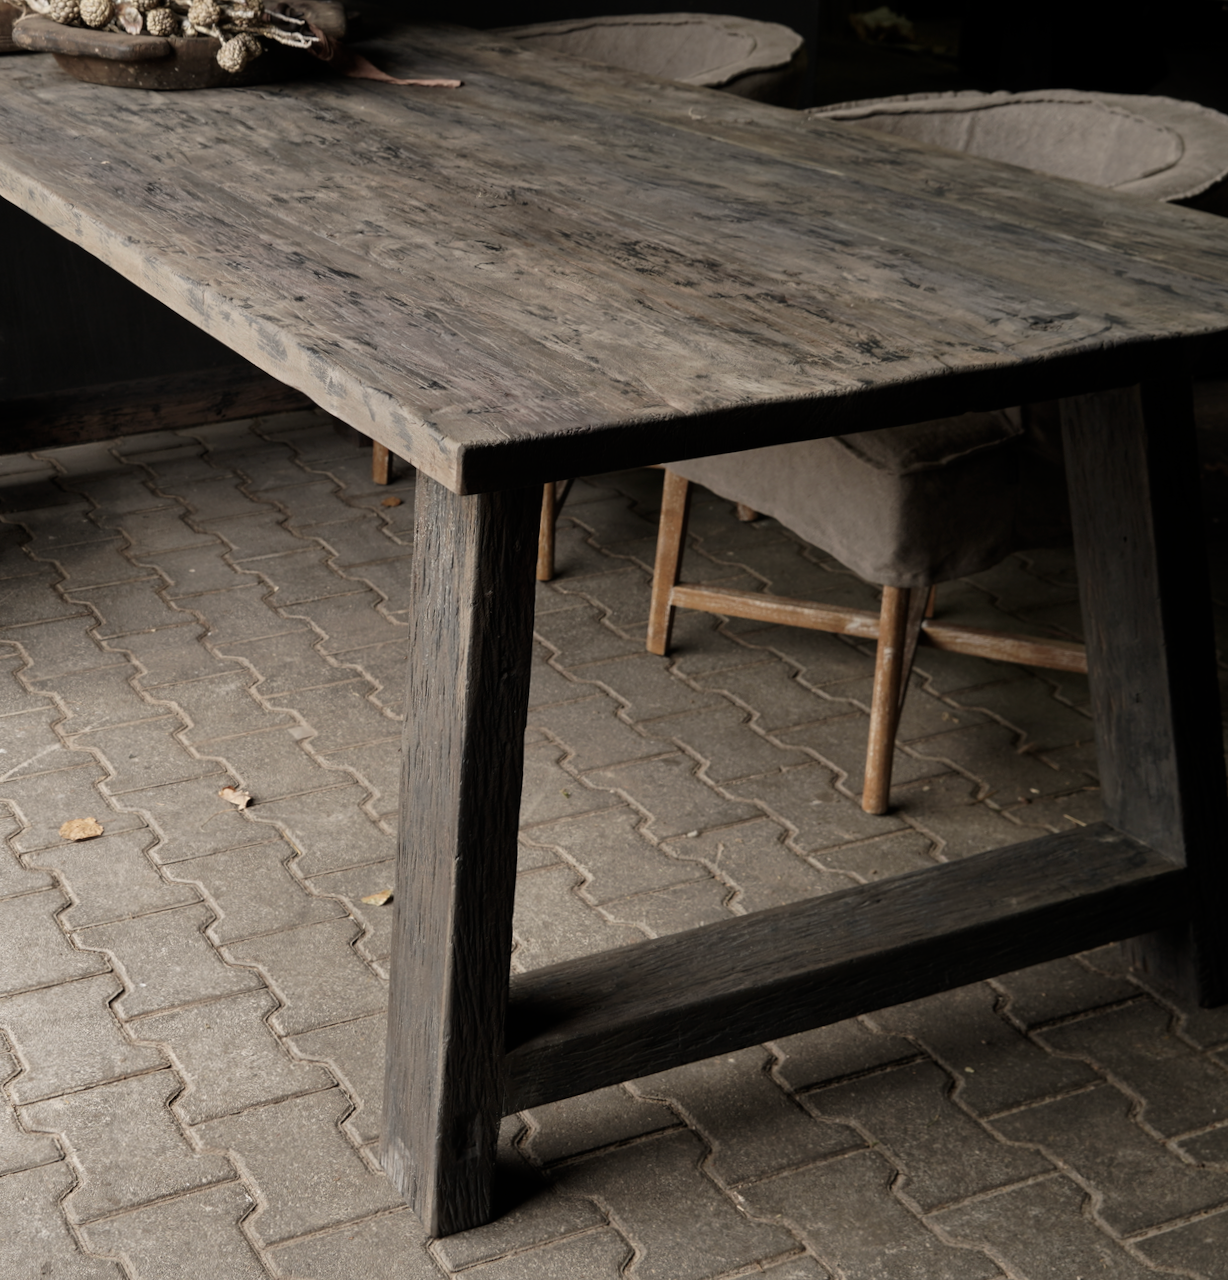 Stoer donker oud houten eetkamer tafel  met A poot-4